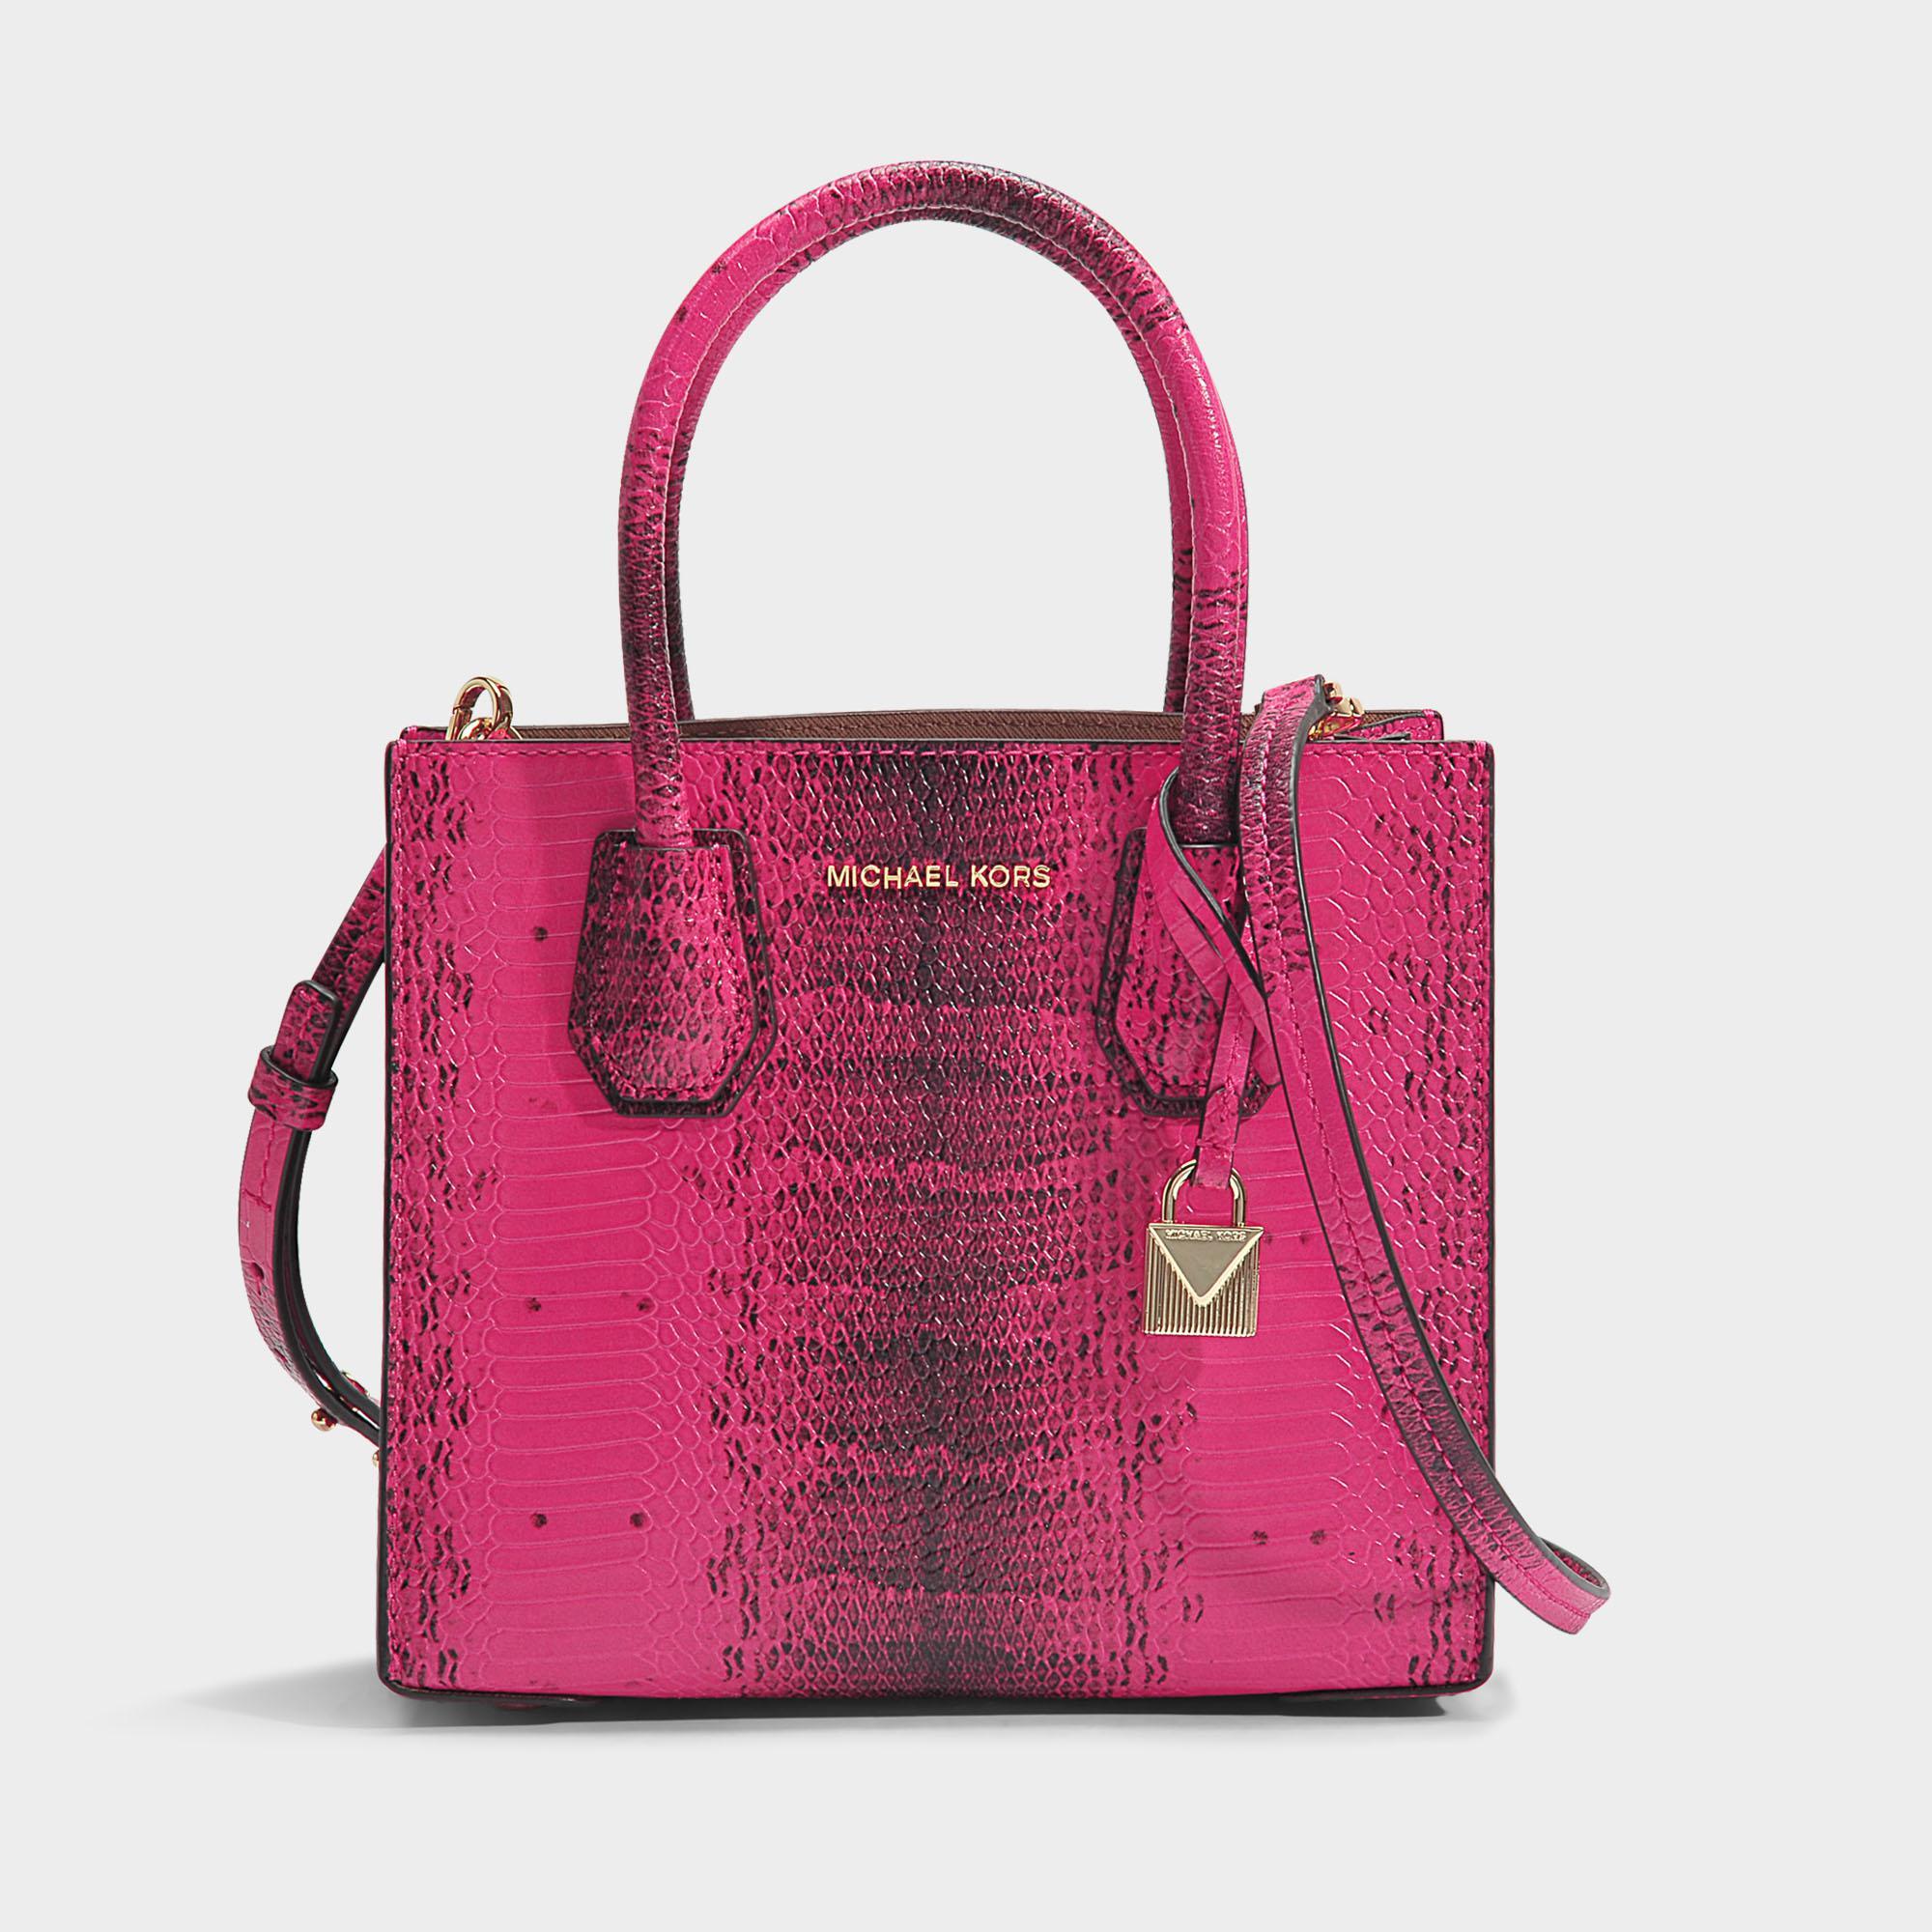 445fad46a0ef MICHAEL Michael Kors Mercer Medium Messenger Bag In Ultra Pink ...